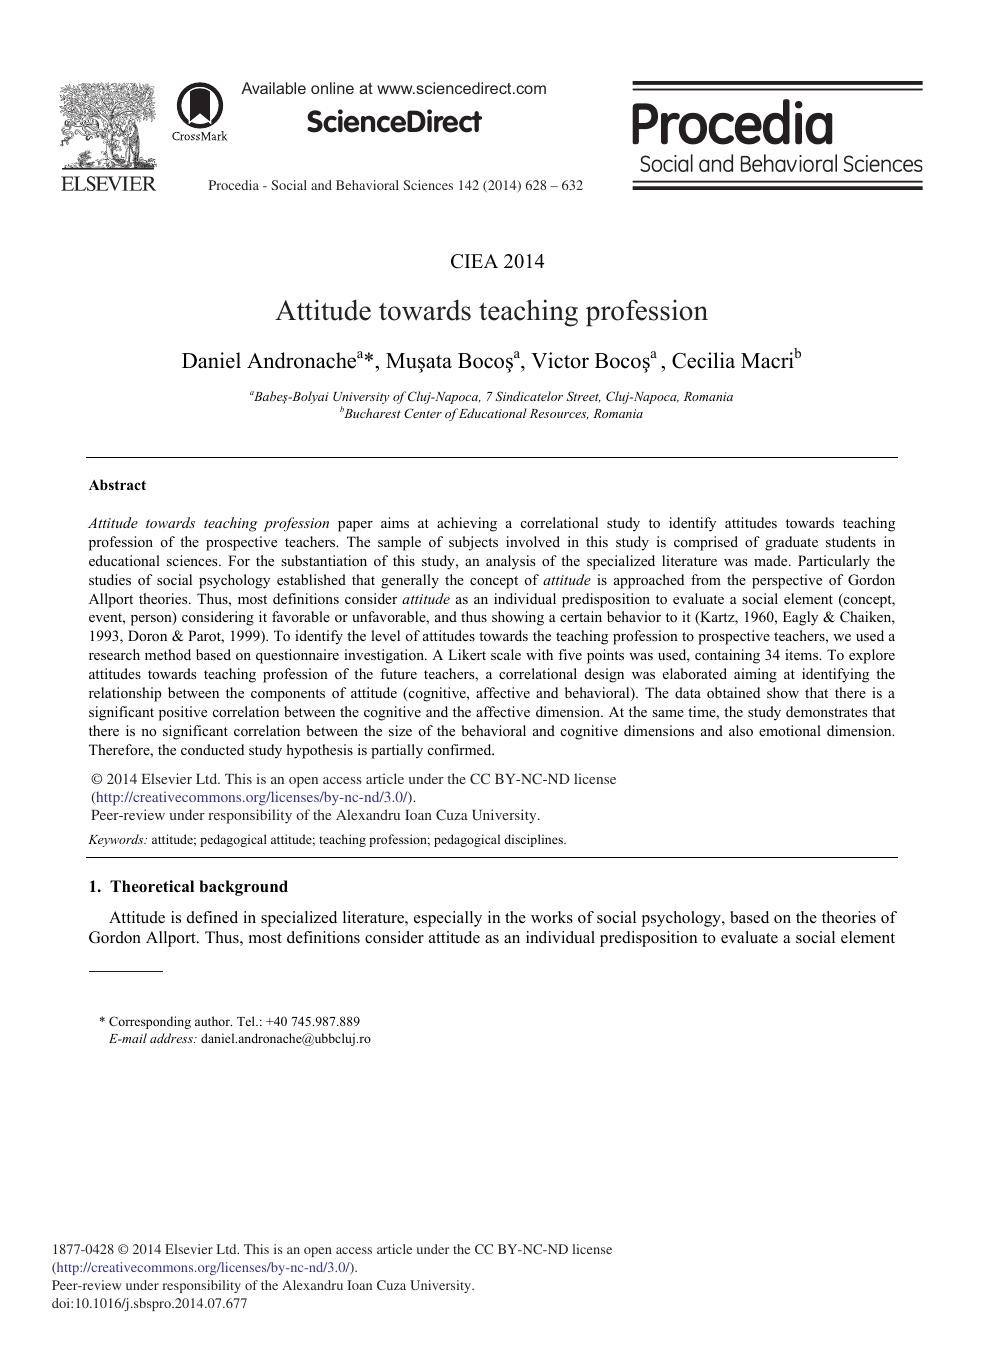 define social psychology paper